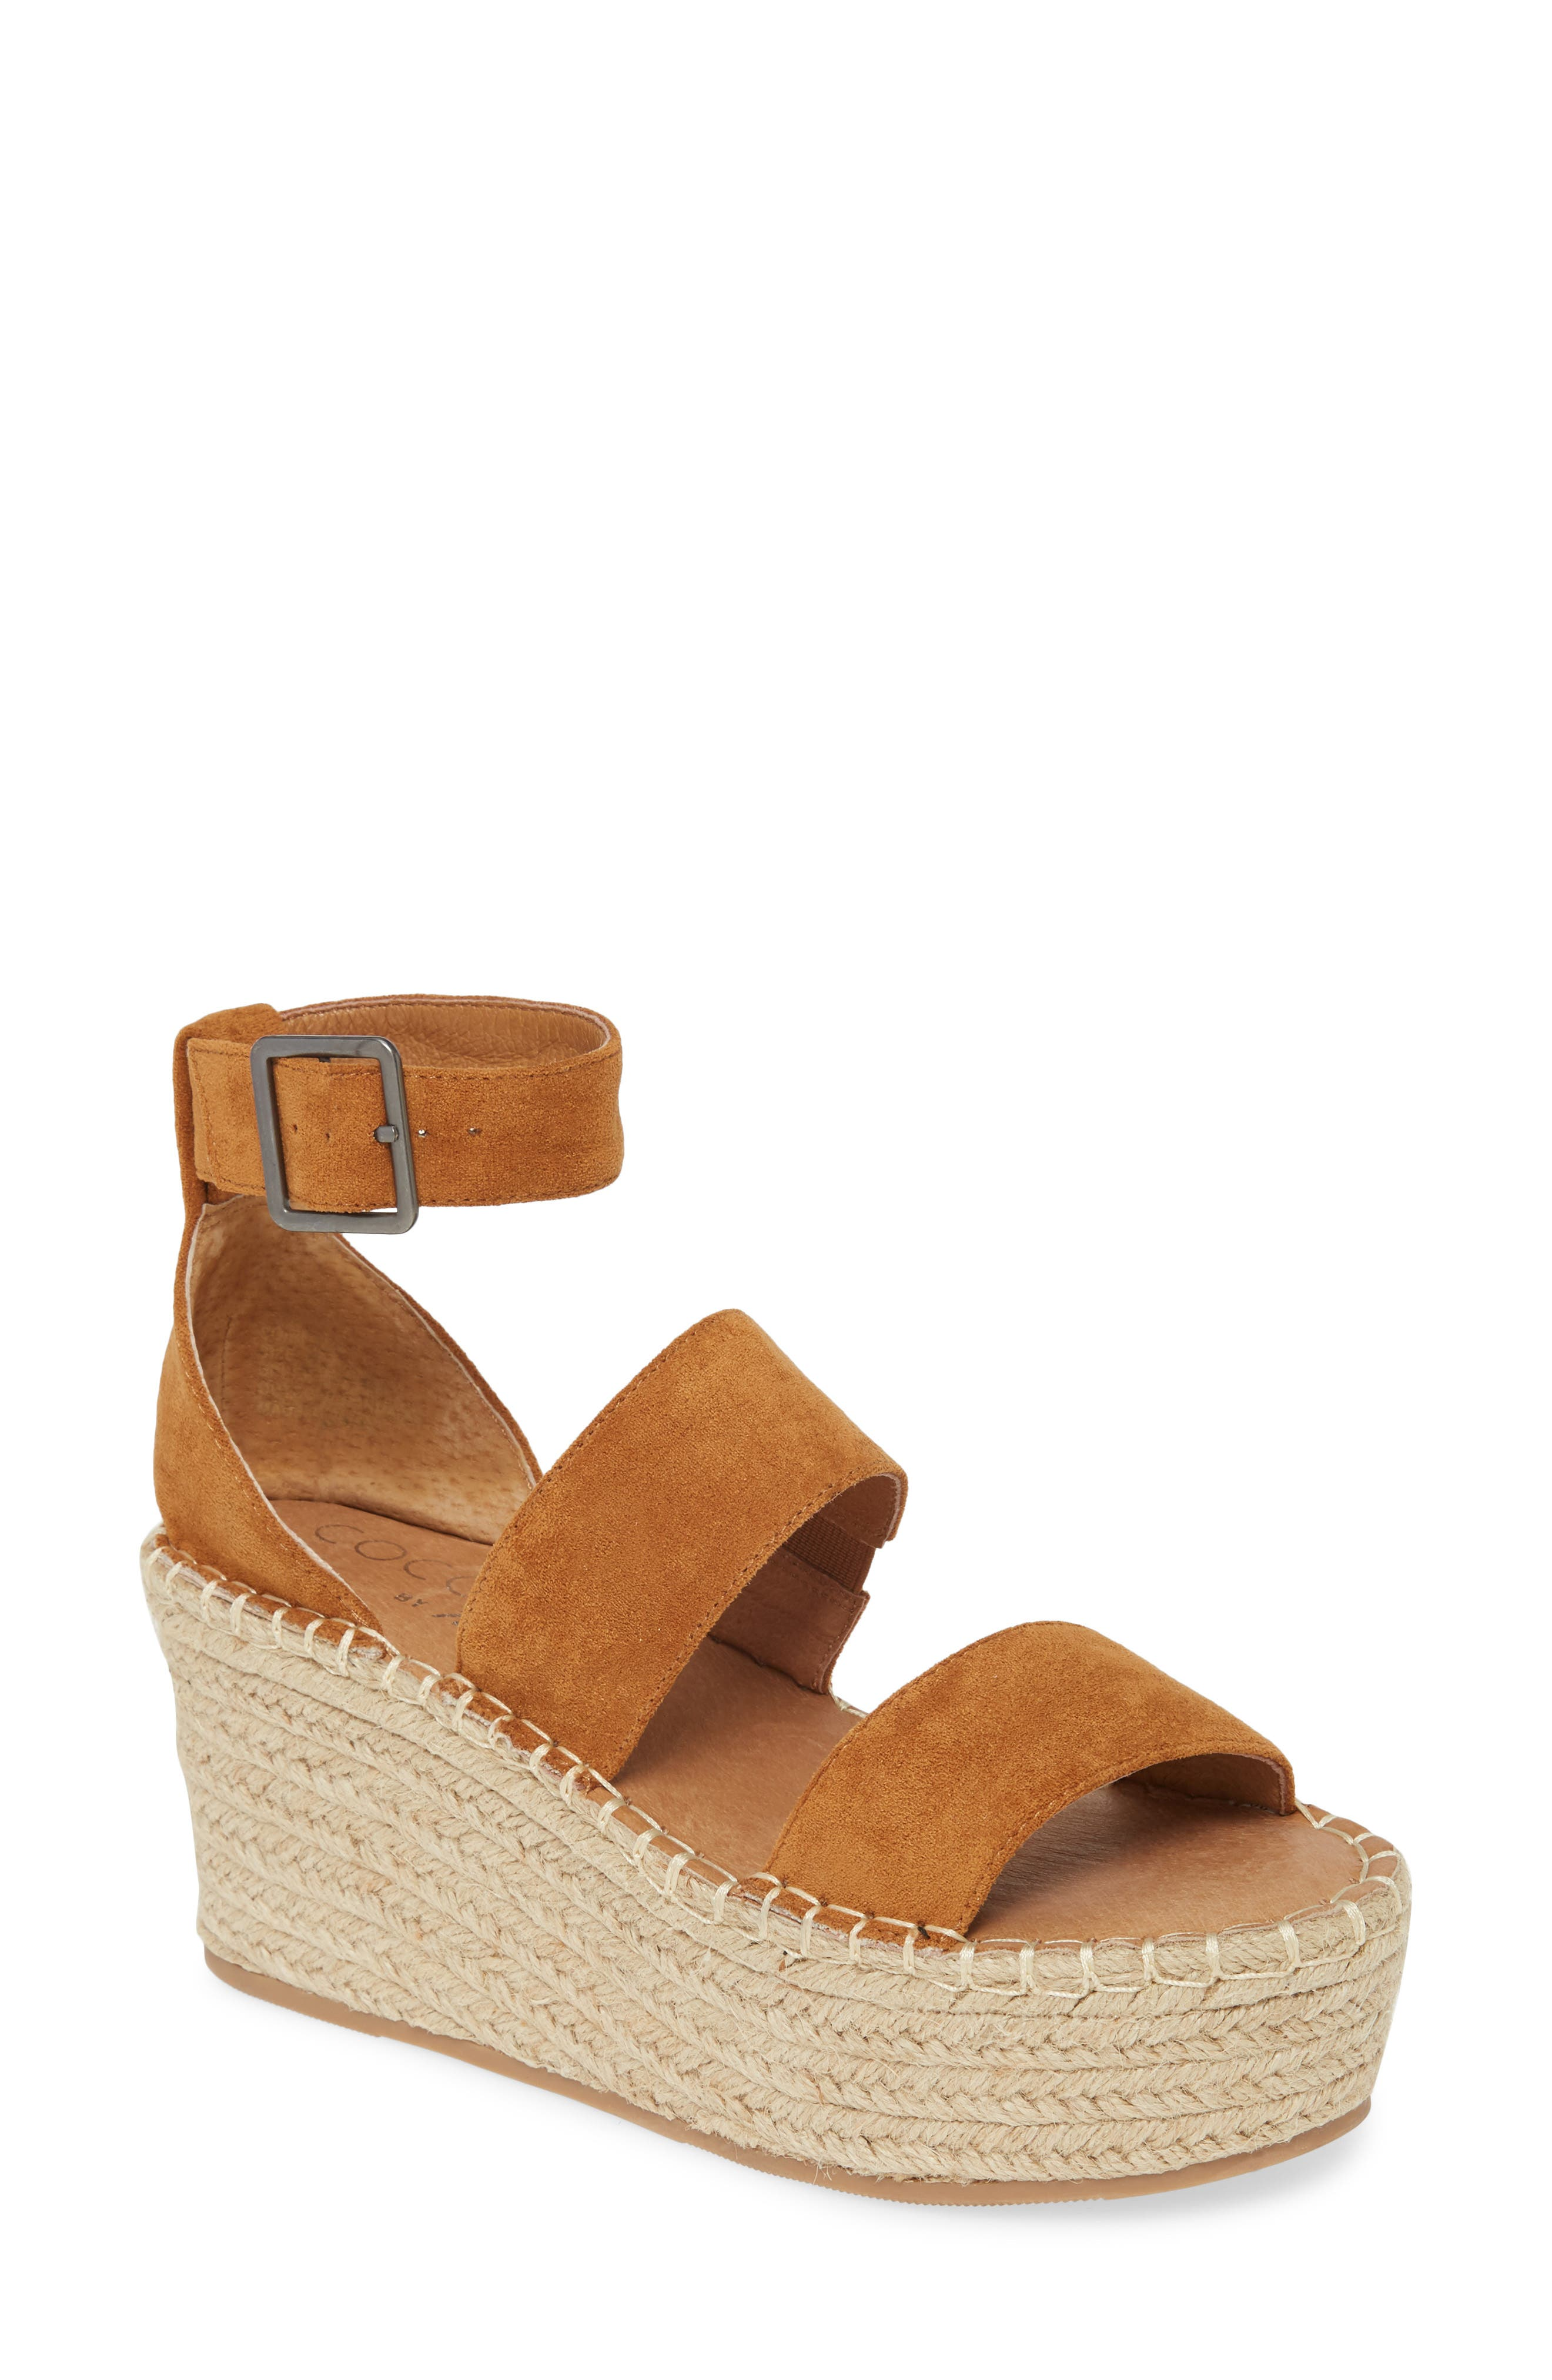 Soire Platform Wedge Sandal